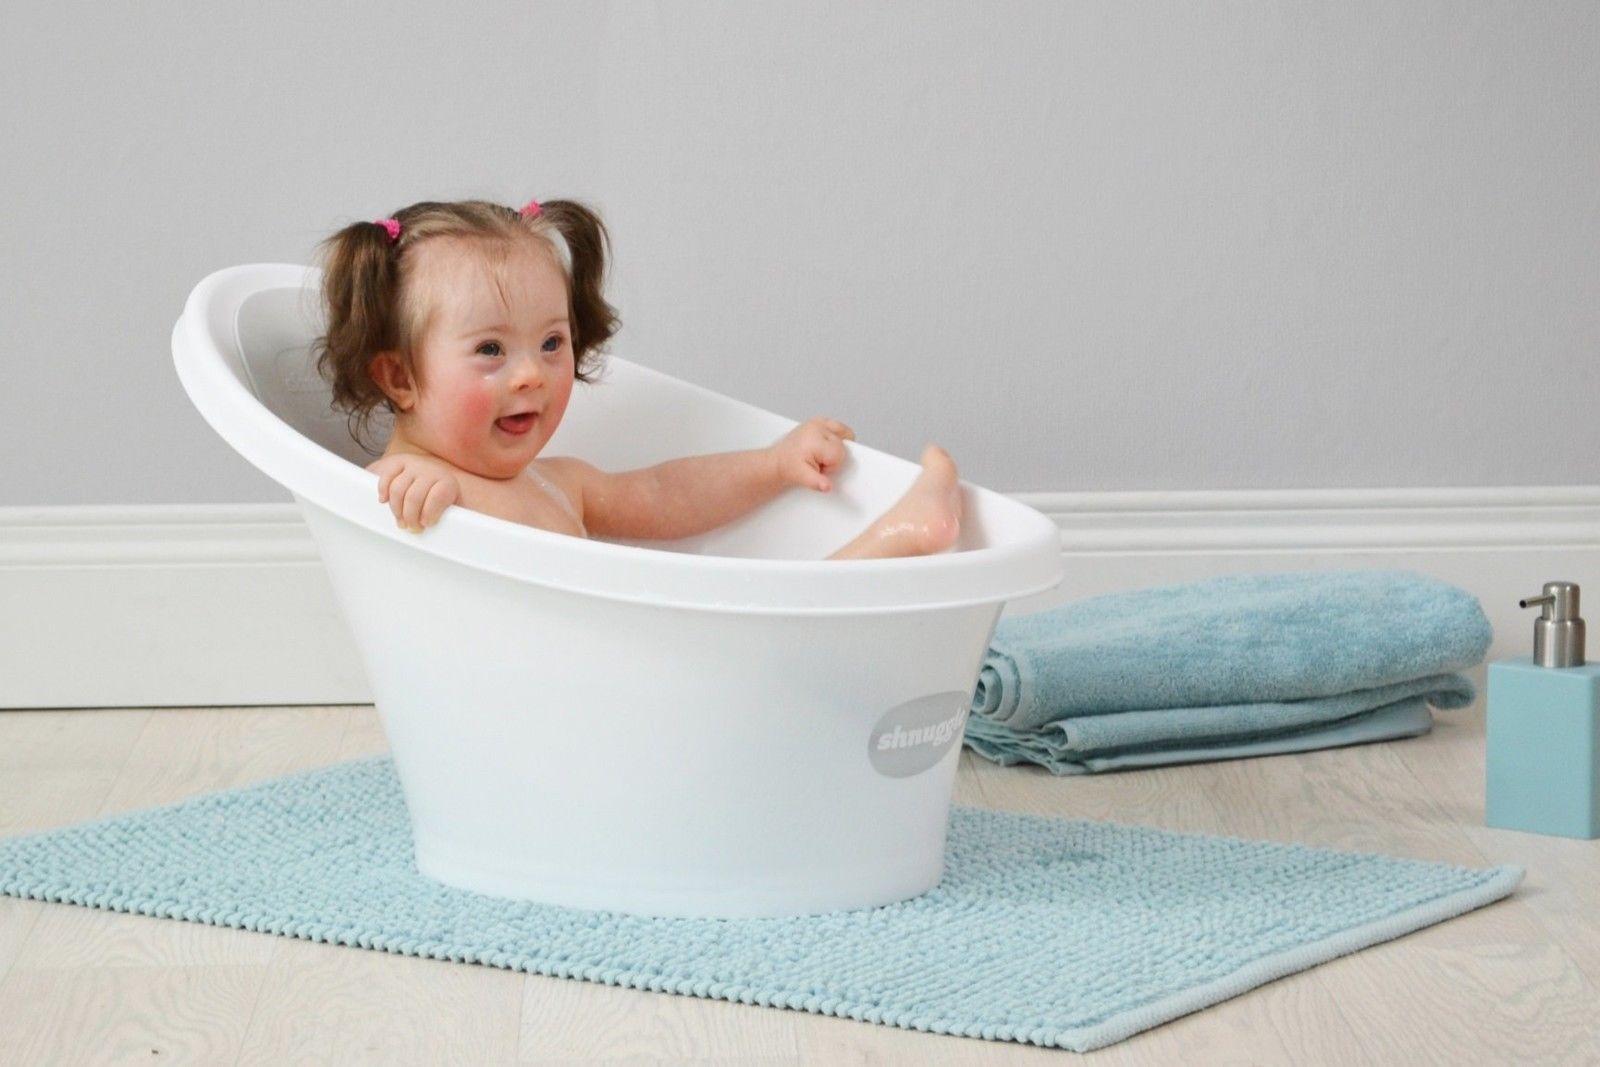 Shnuggle Baby Bath Tub - Compact Support Seat, Makes Bath Time Easy ...